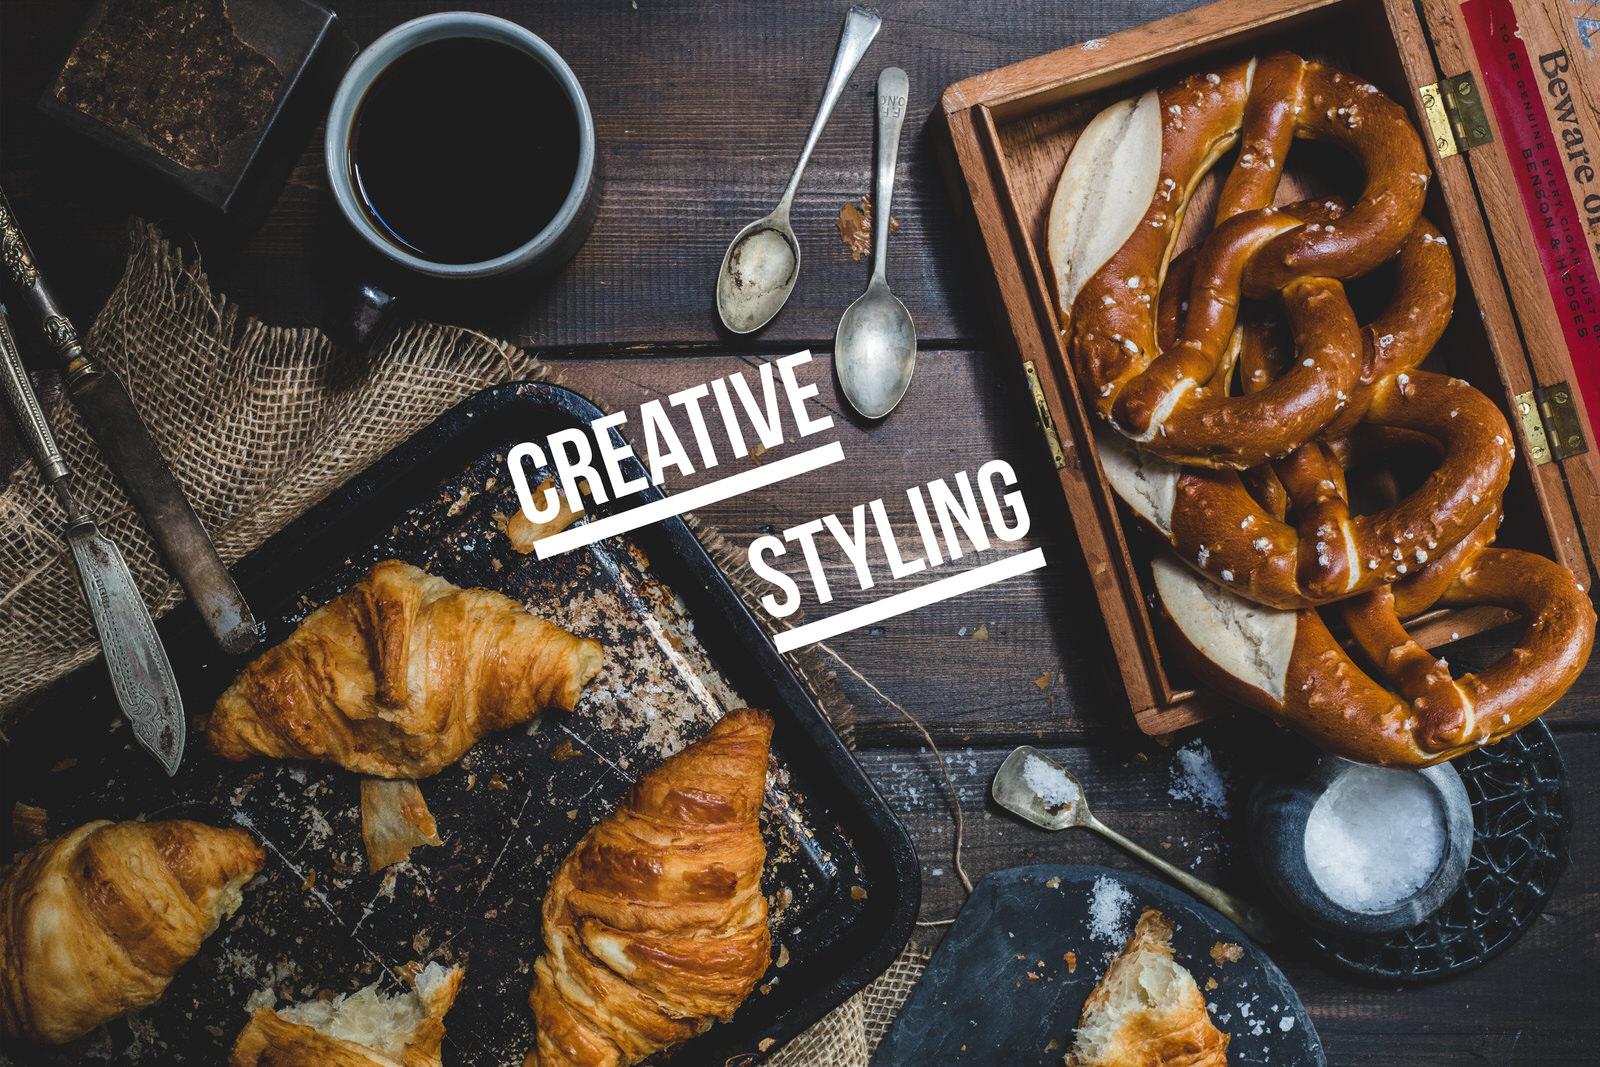 creative stylingg